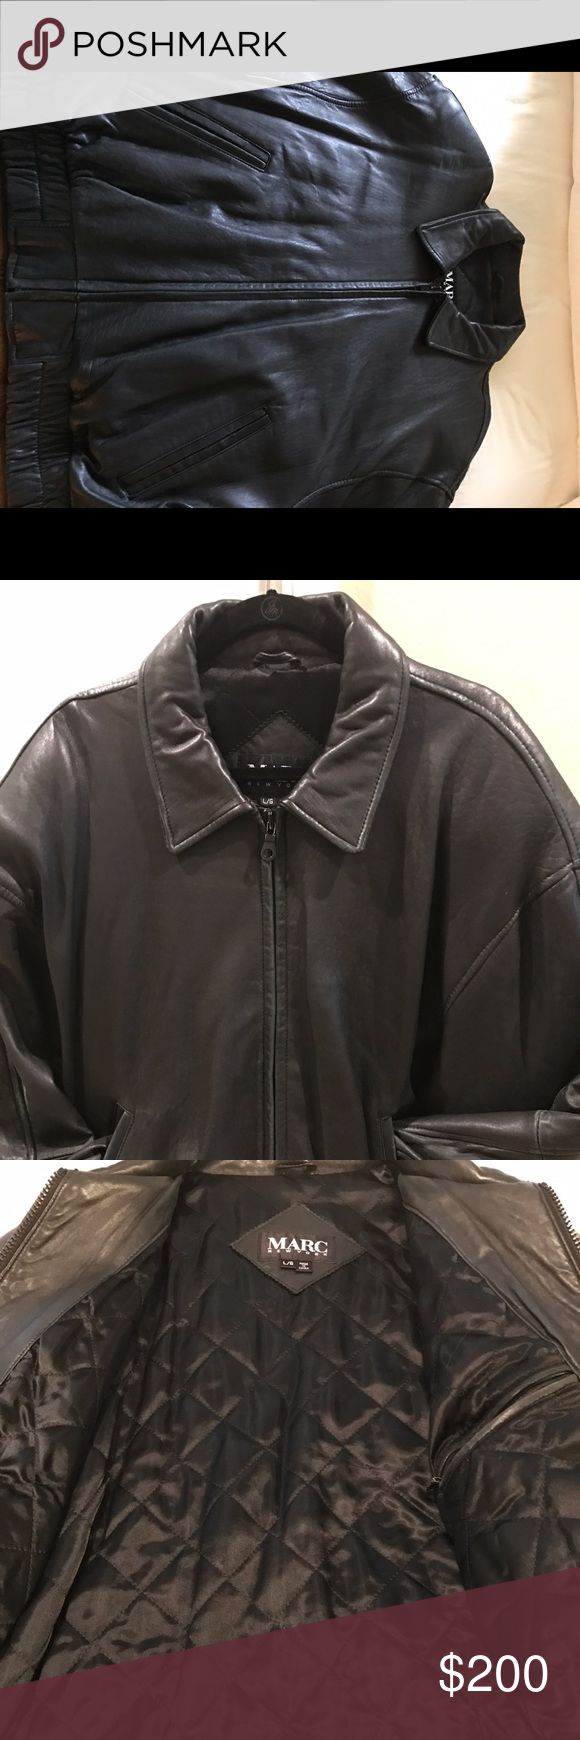 Marc New York men's leather bomber jacket Marc New York Beautiful black soft jacket size Large zipper front pockets two snaps on sleeve Marc New York Jackets & Coats Bomber & Varsity